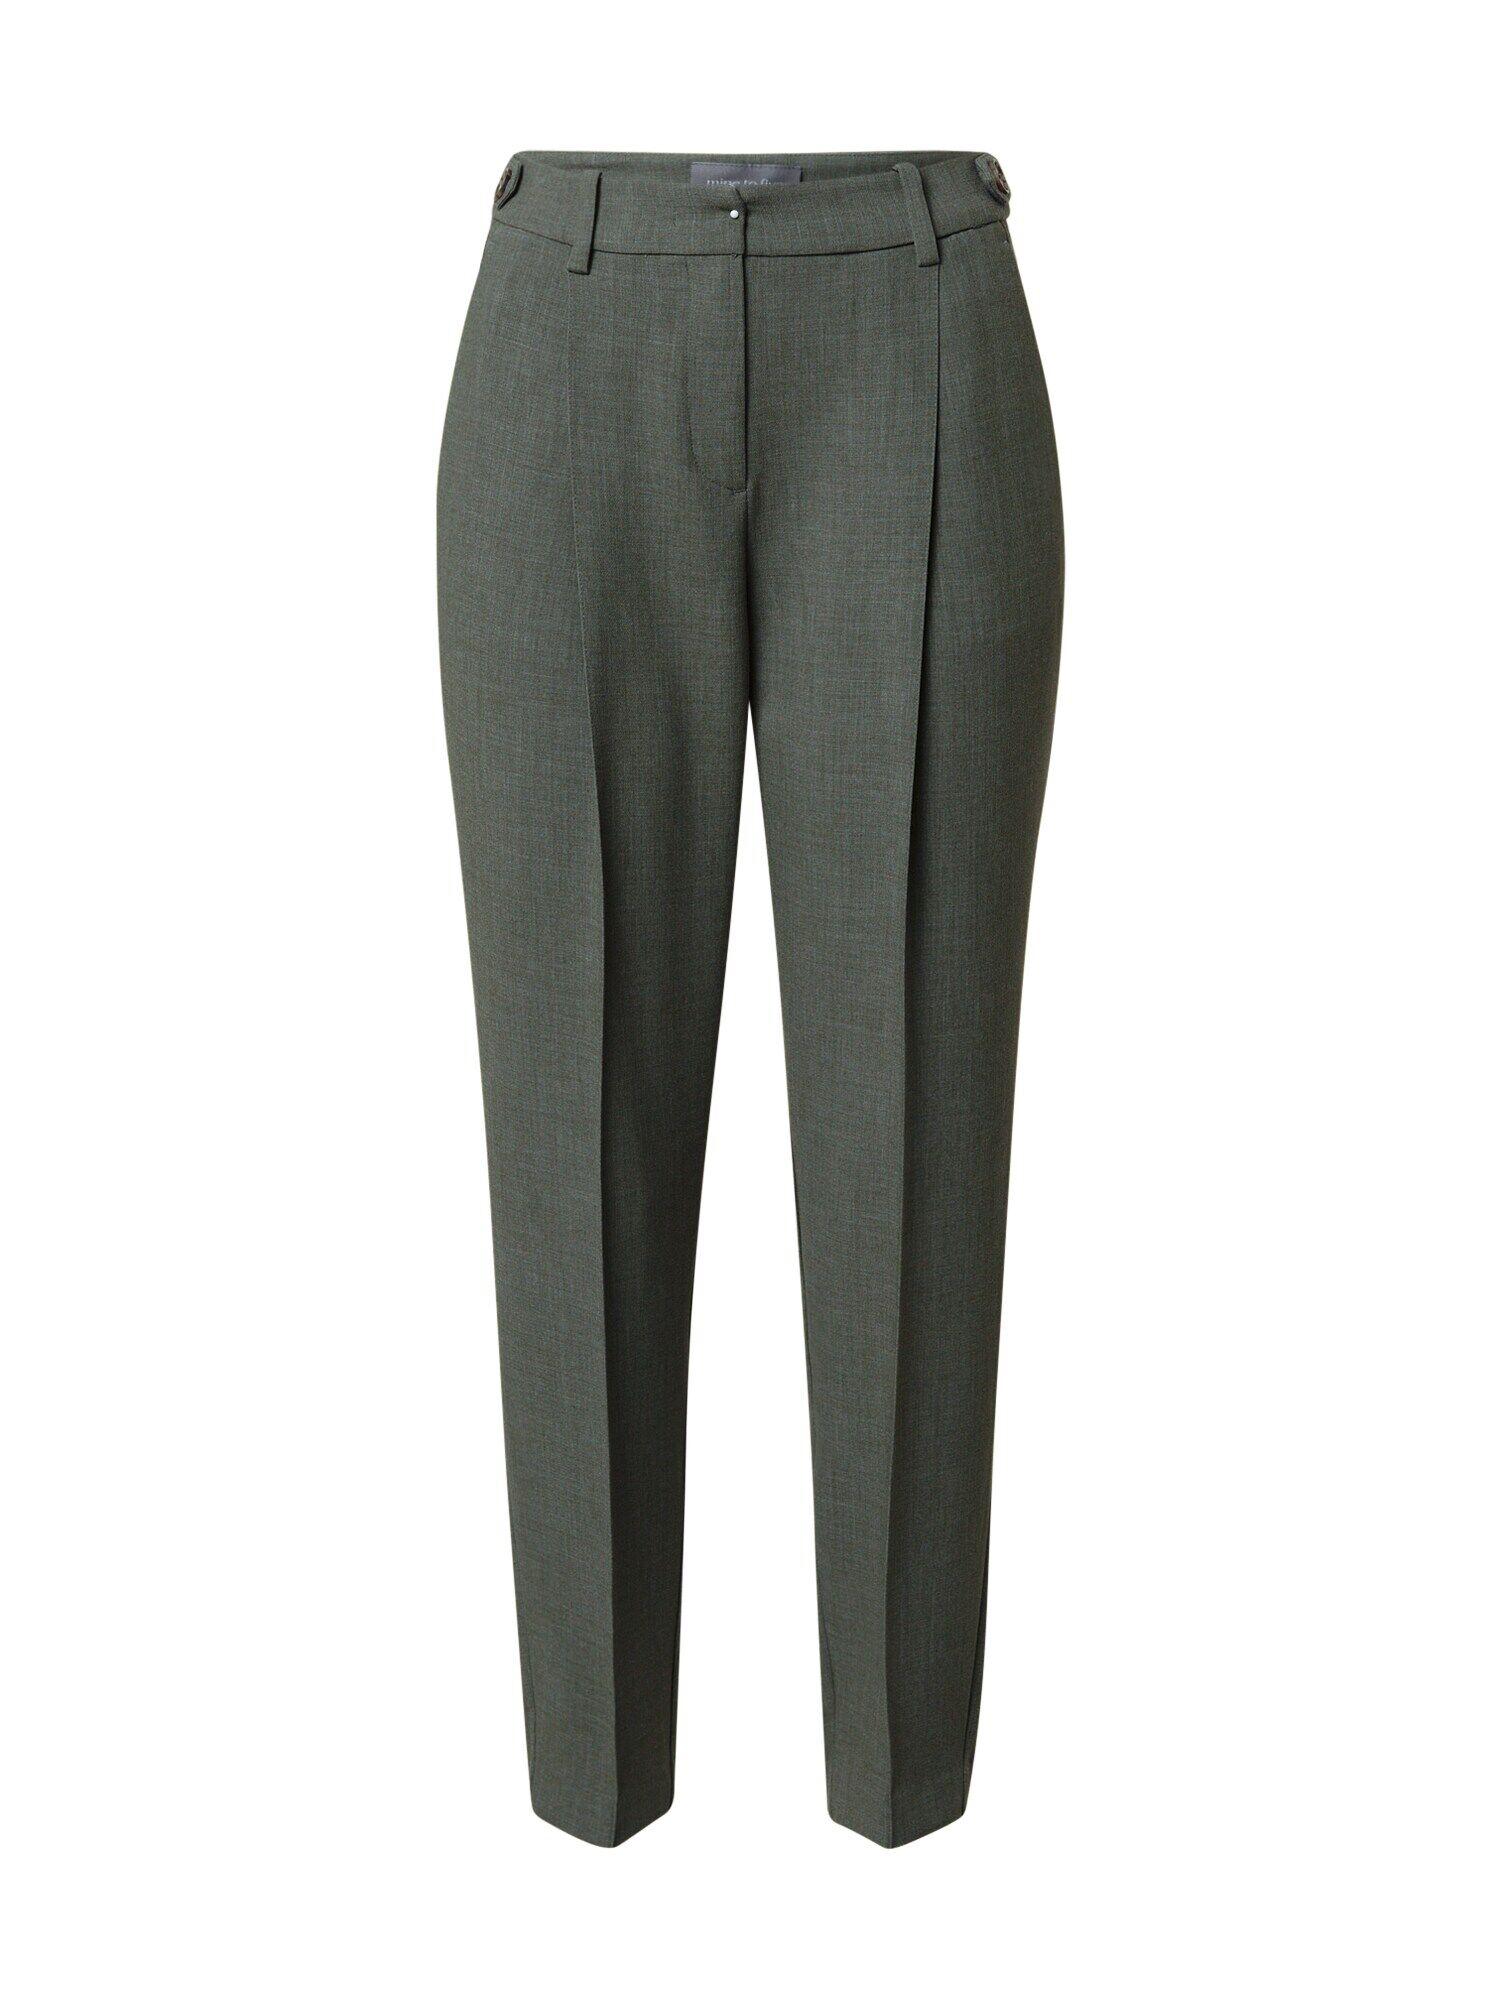 MINE TO FIVE Pantalon à pince  - Vert - Taille: 36 - female